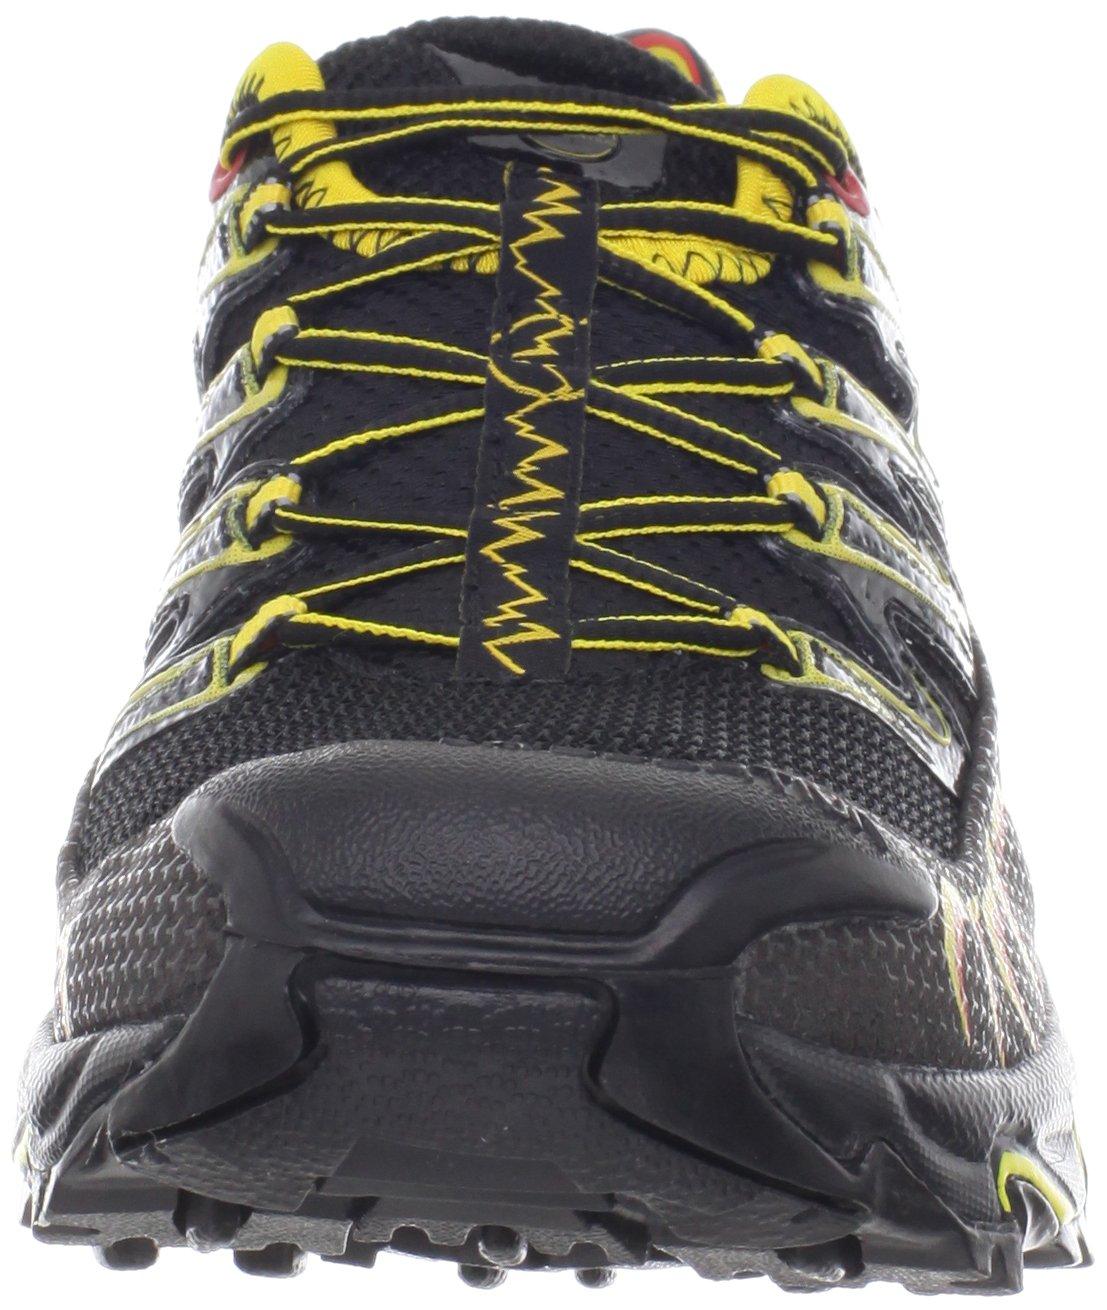 La Sportiva Sportiva Sportiva Herren Trail Running Schuhe Leichtwanderschuhe Ultra Raptor 20ff7d